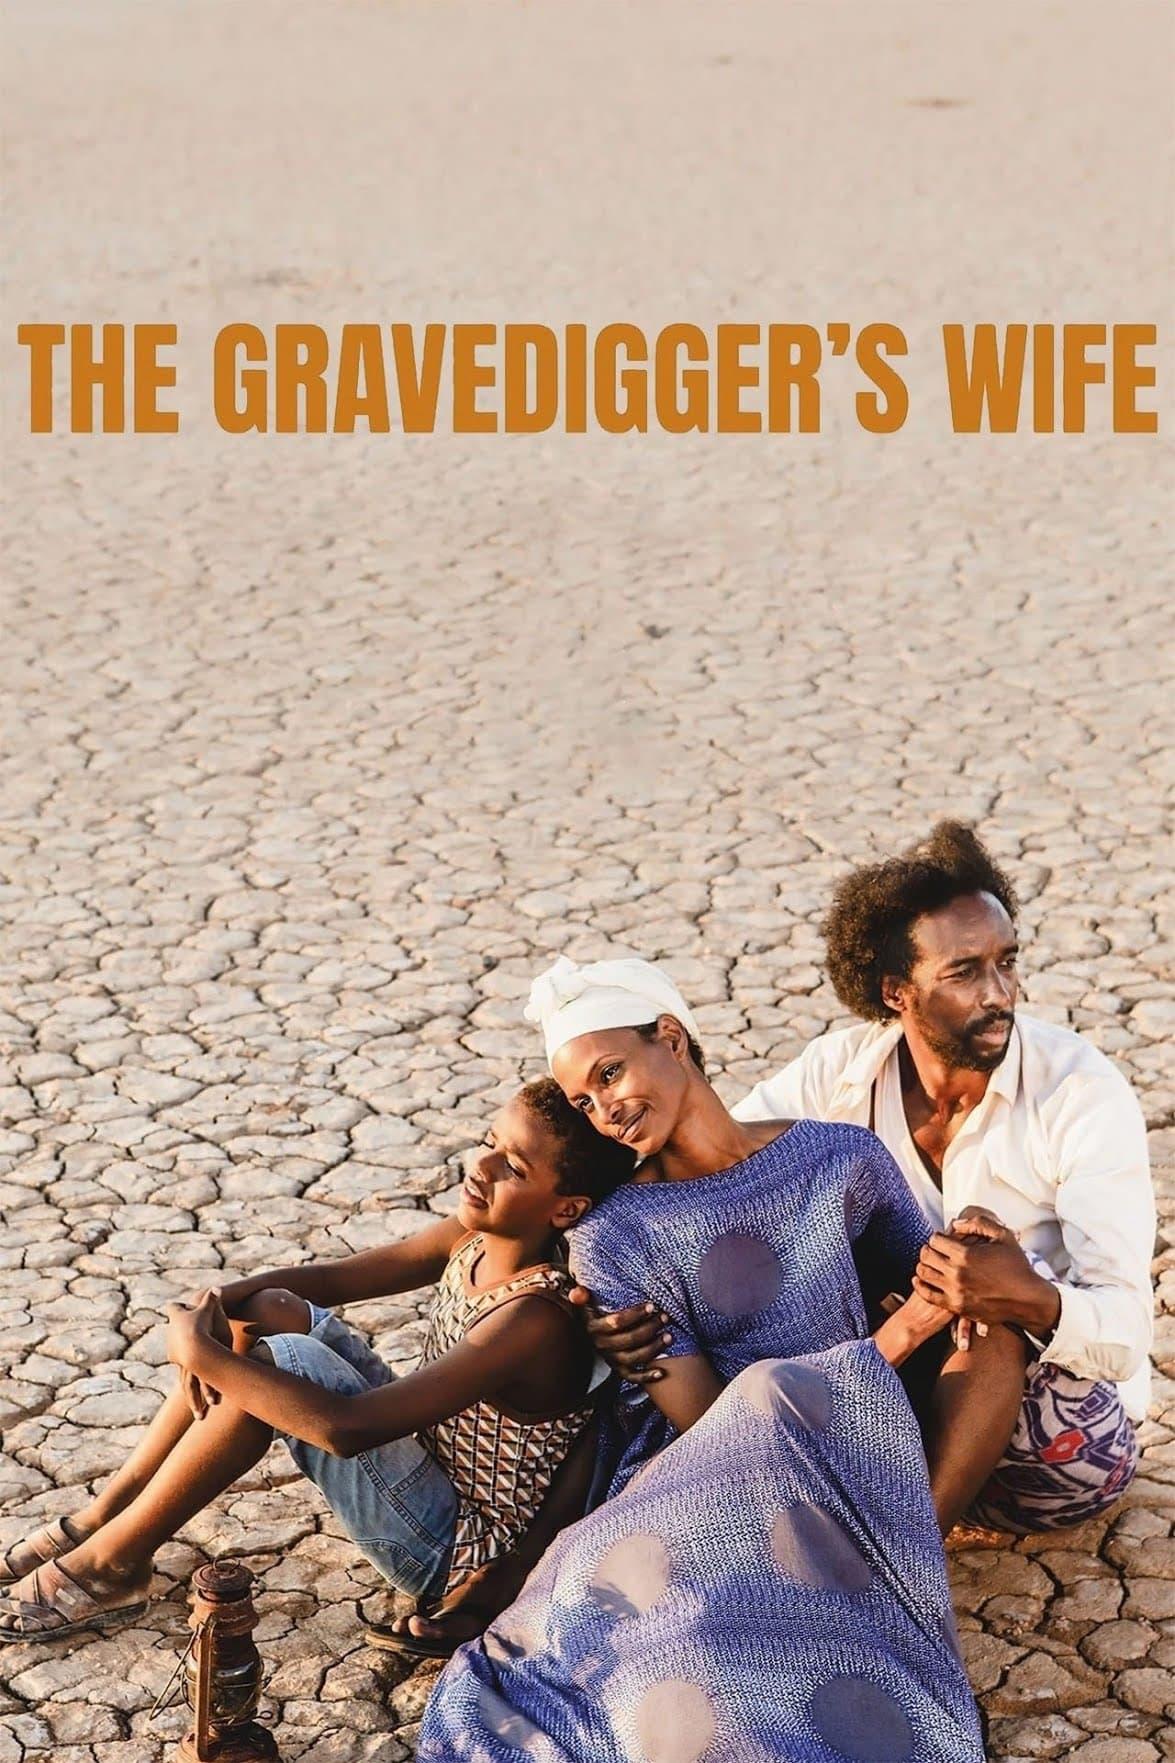 The Gravedigger's Wife